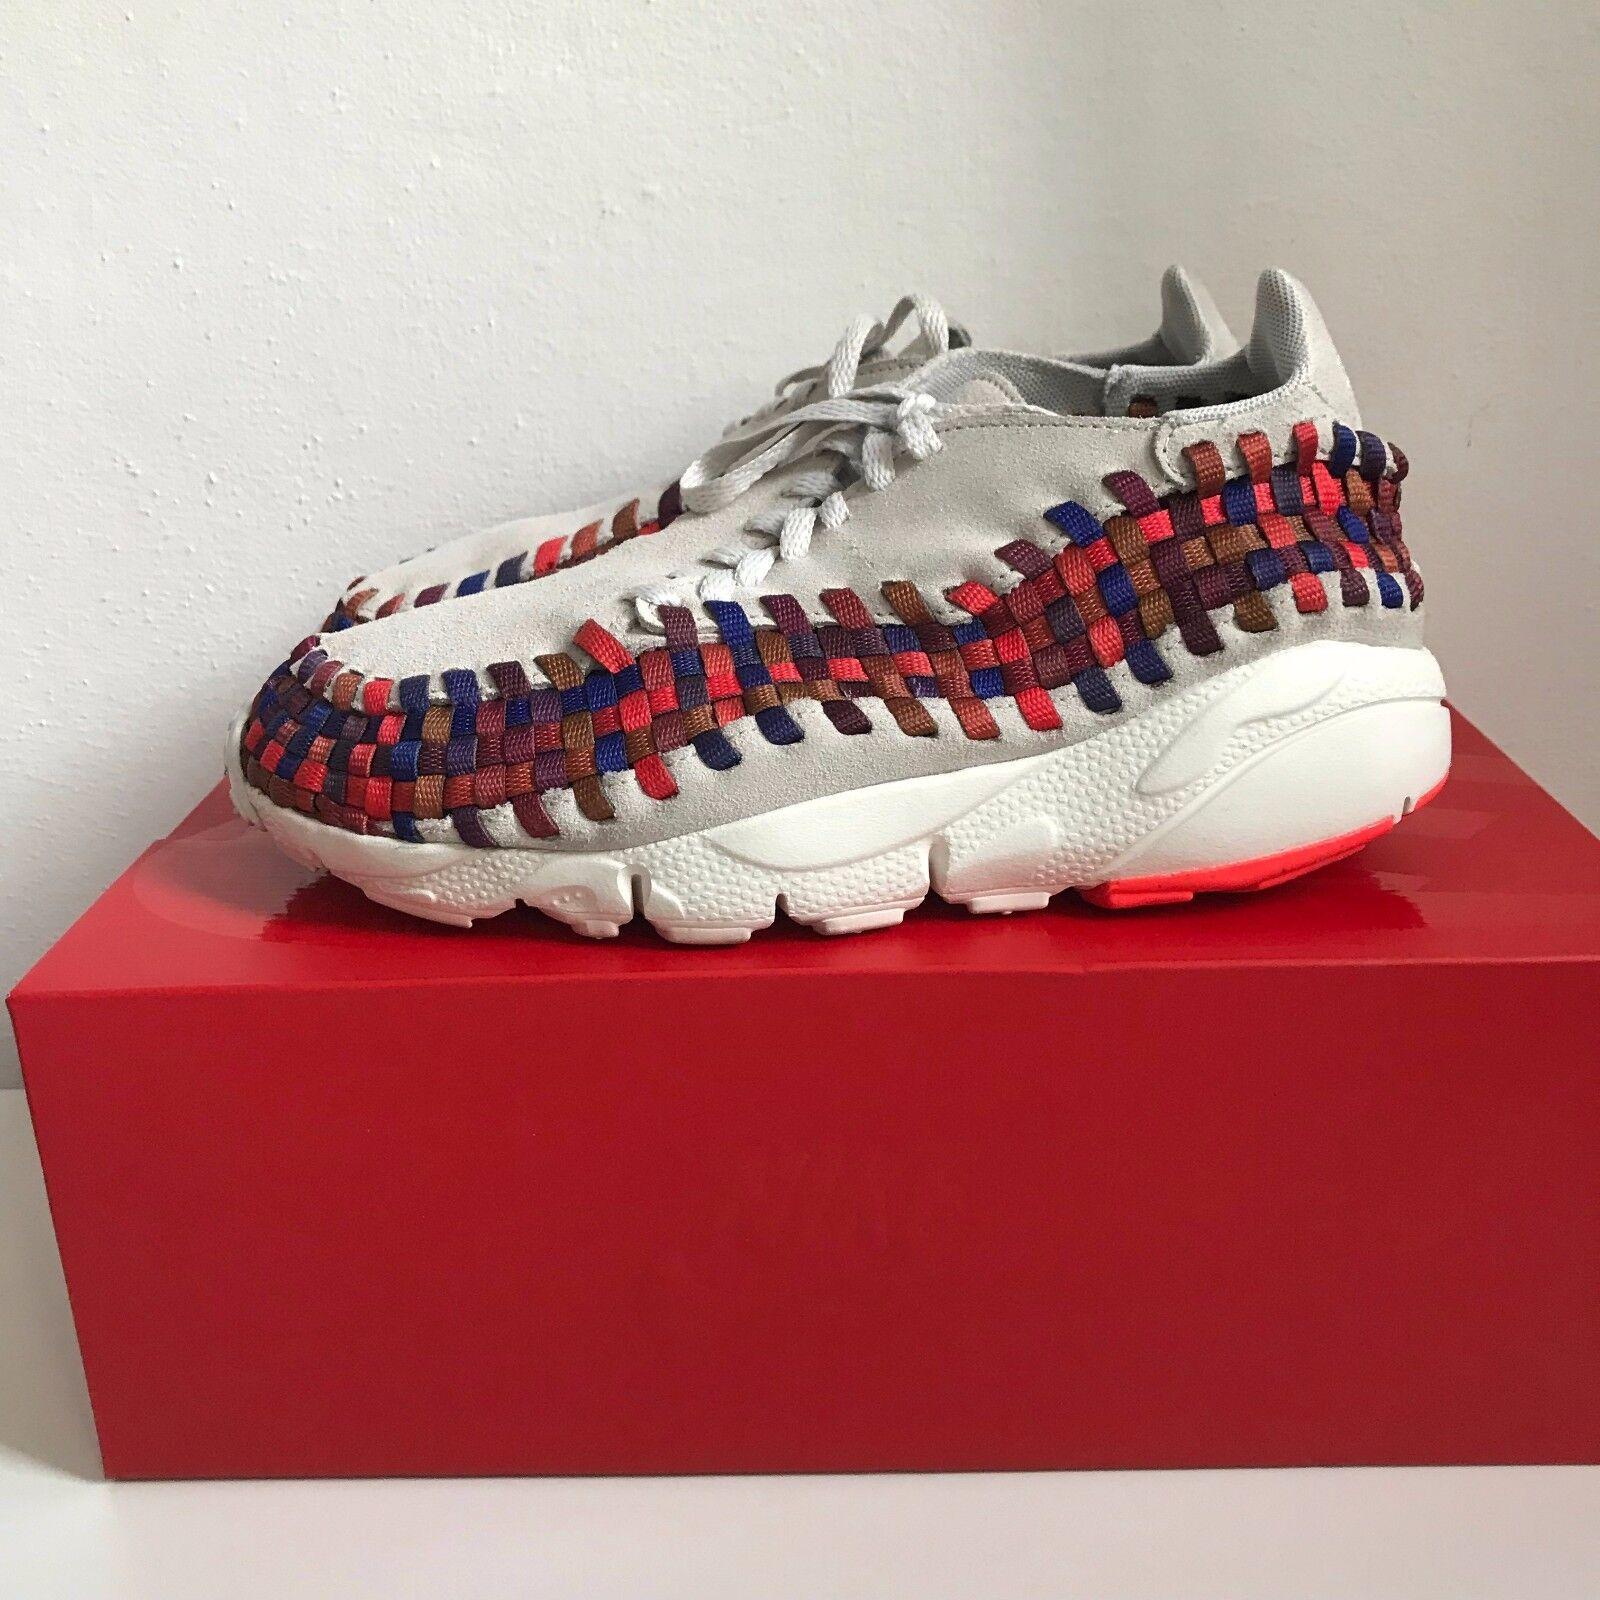 Nike Air Footscape Woven Light Bone Multicolor Rainbow US6 UK5.5 EUR38.5 CM24